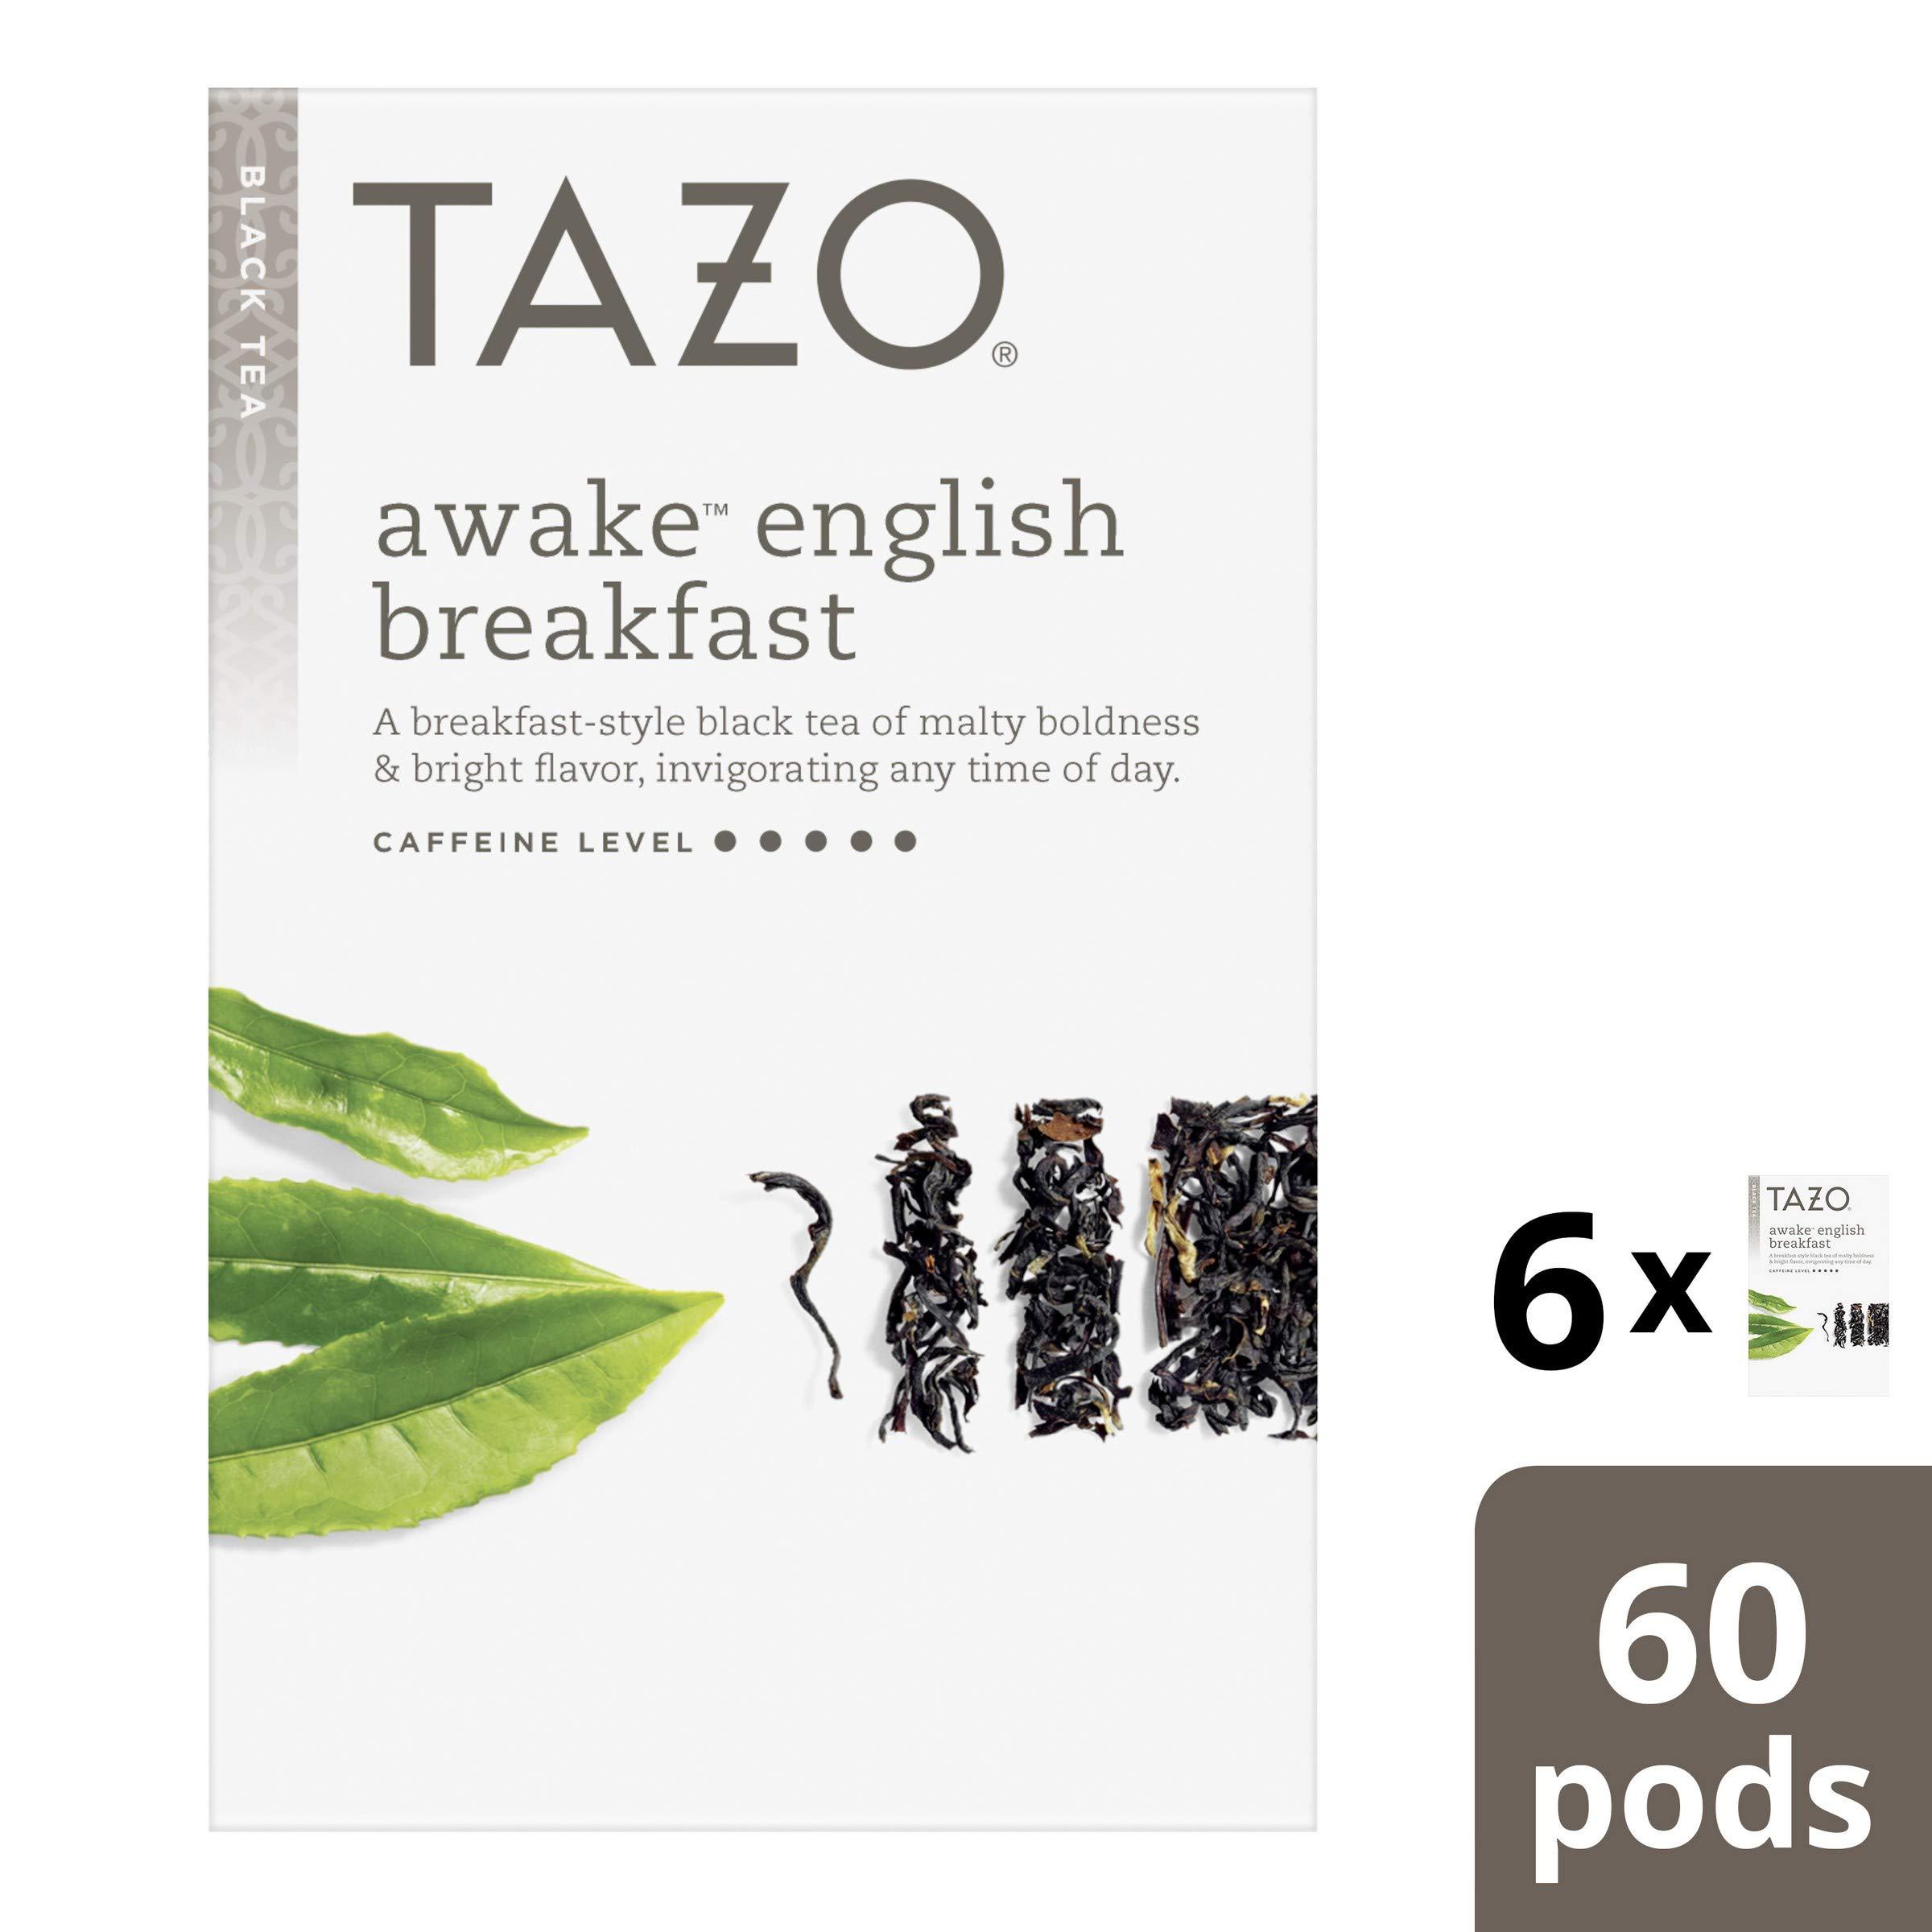 Tazo Tea K-Cup Awake English Breakfast Tea 10 count (Pack of 6) by TAZO